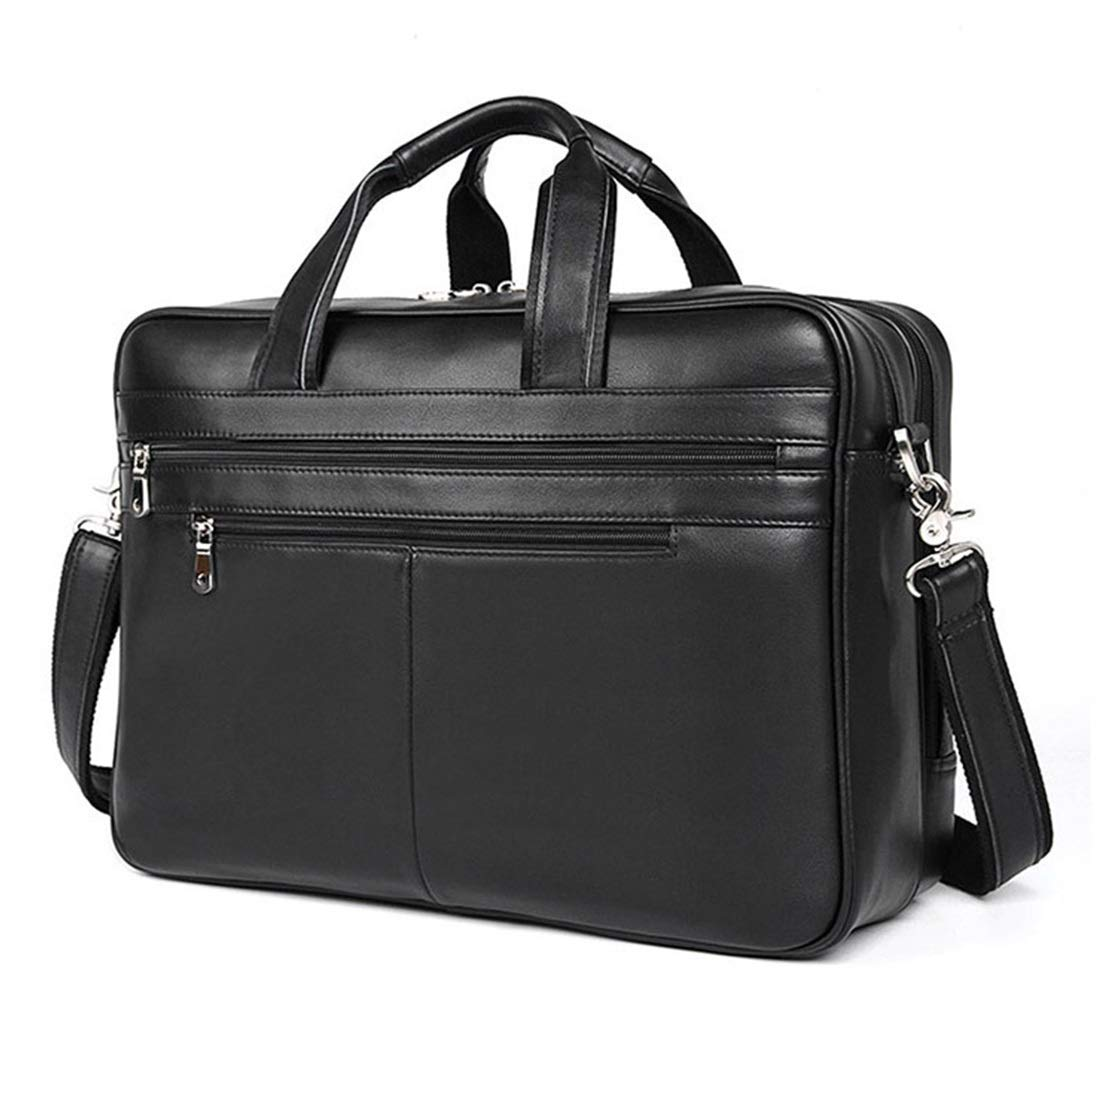 KRPENRIO 本革ブリーフケース メンズ トート ハンドバッグ ショルダー メッセンジャー サッチェルバッグ ノートパソコン MacBook用 (カラー:ブラック)   B07MMDVKRC